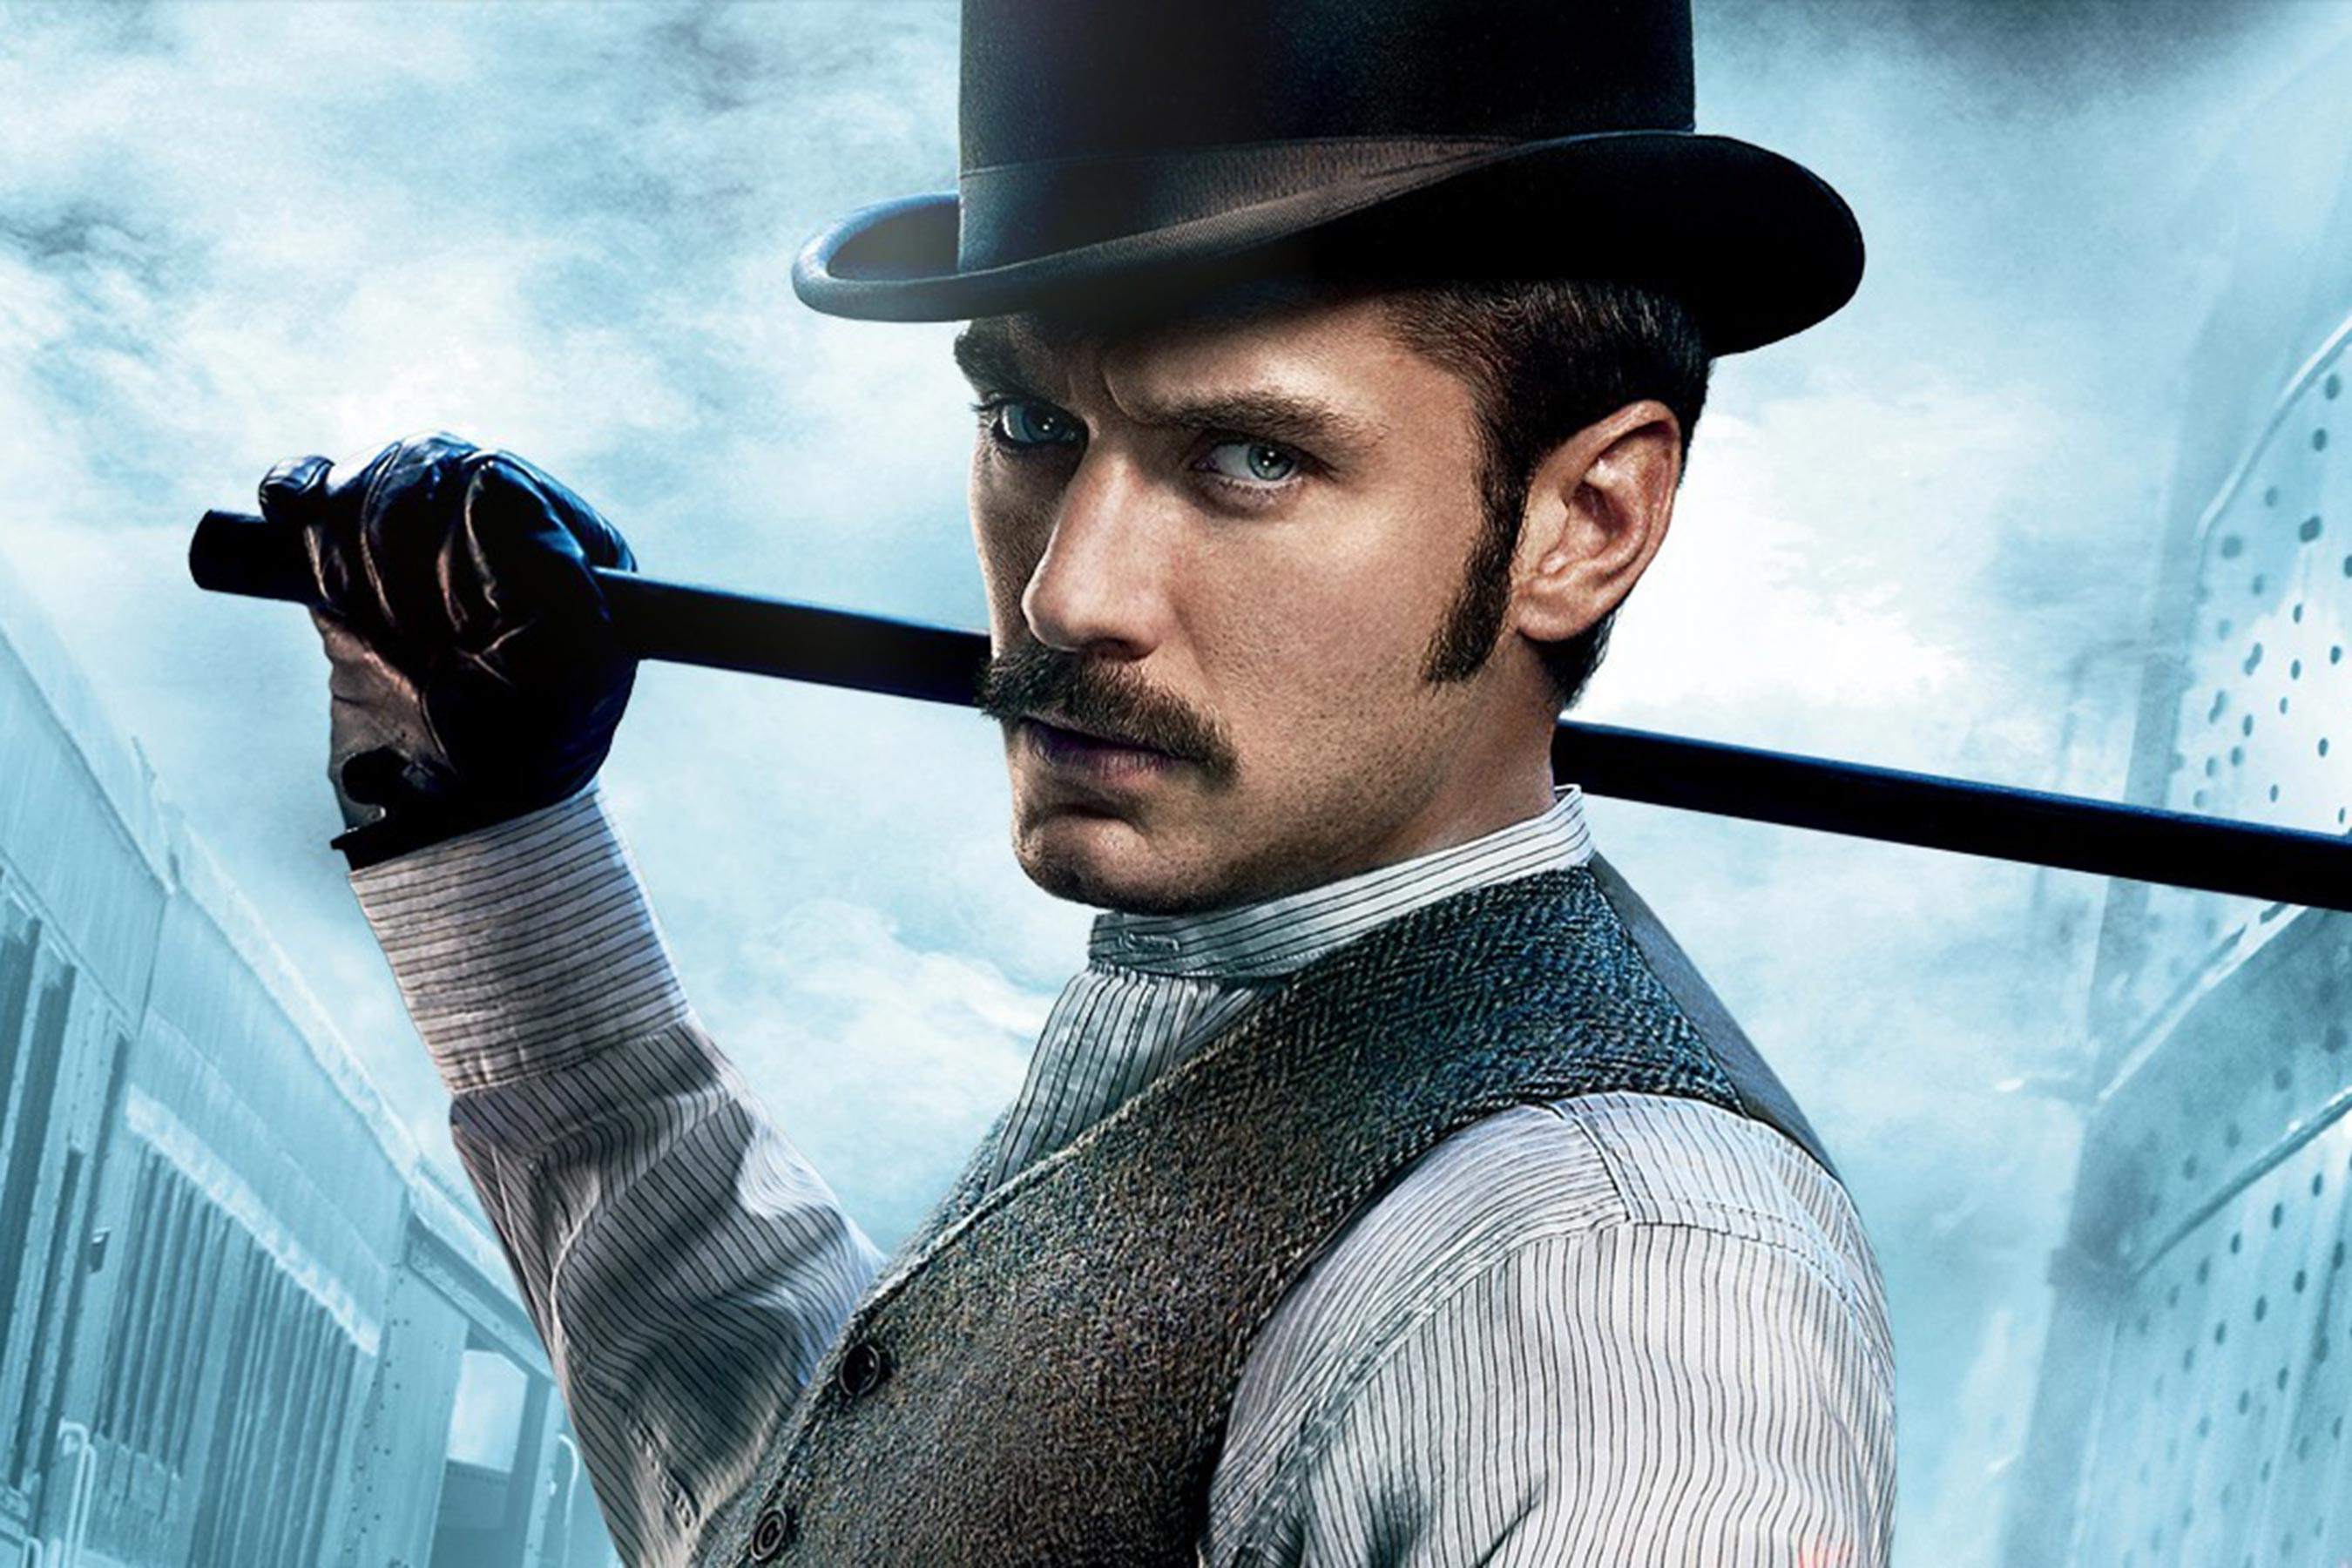 Джуд Лоу раскрыл подробности о сюжете «Шерлока Холмса 3»